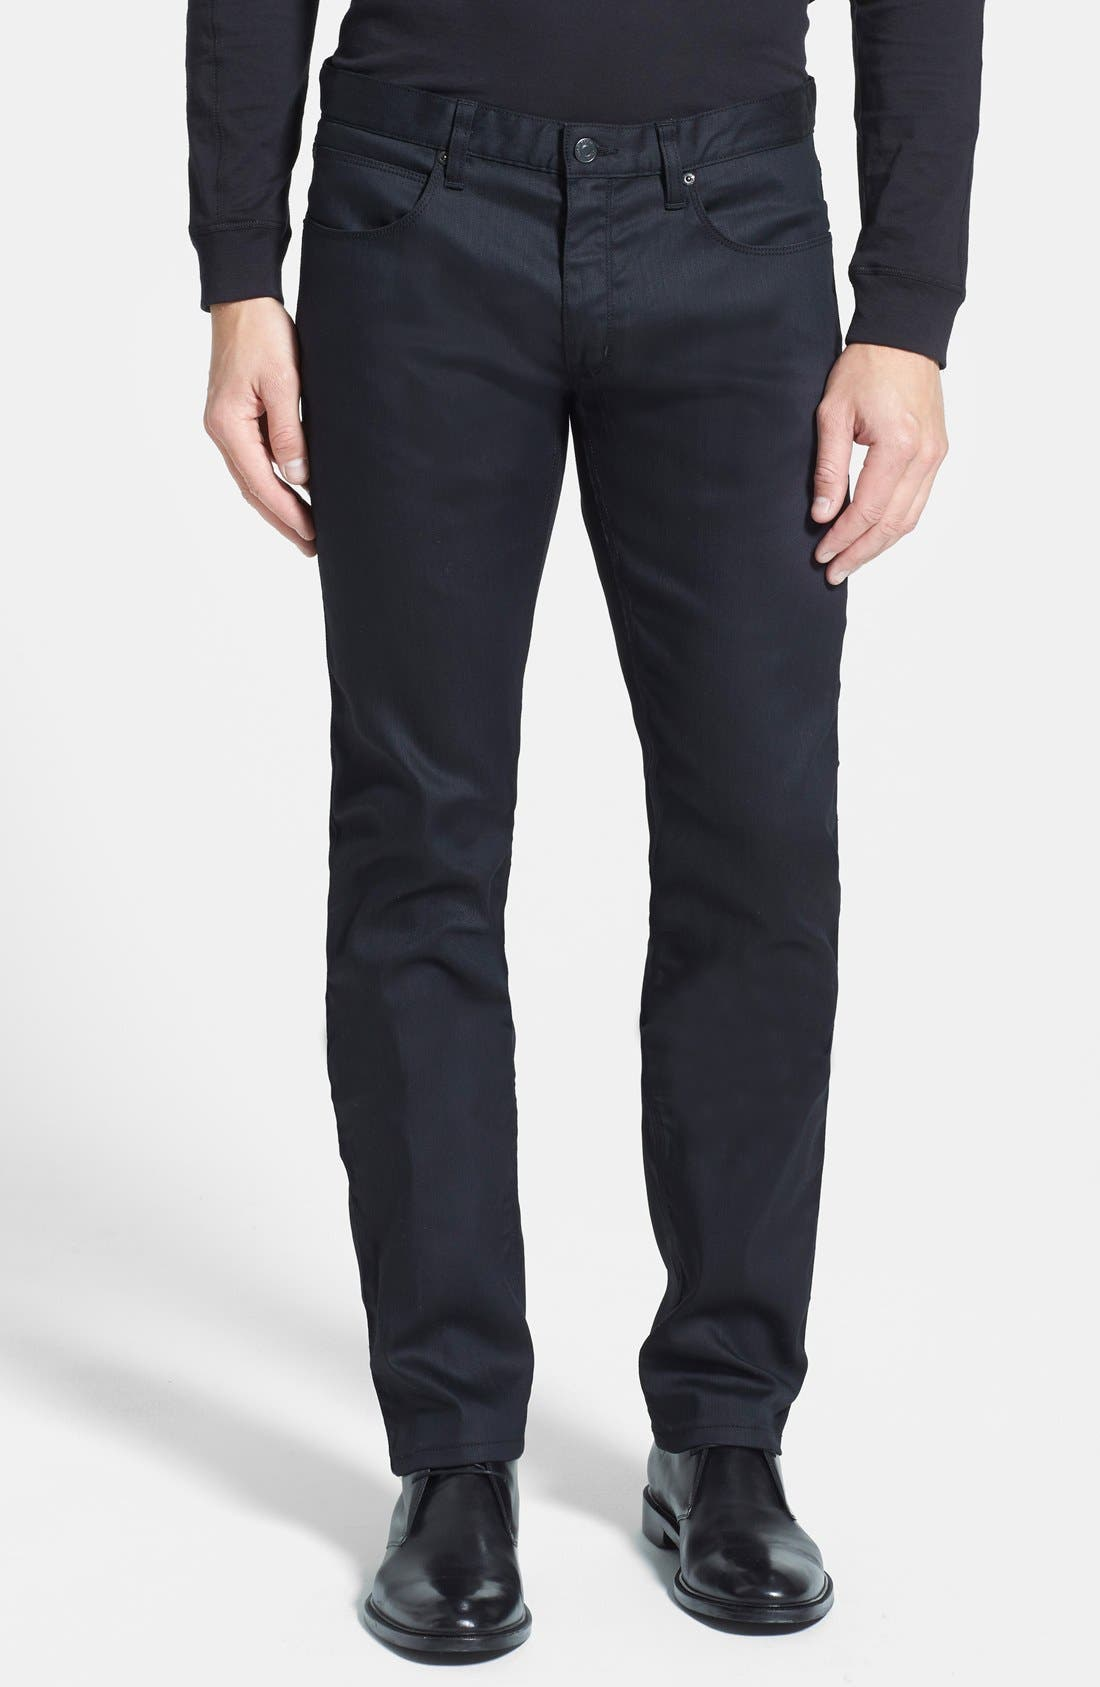 HUGO '708' Slim Fit Jeans,                             Main thumbnail 1, color,                             001